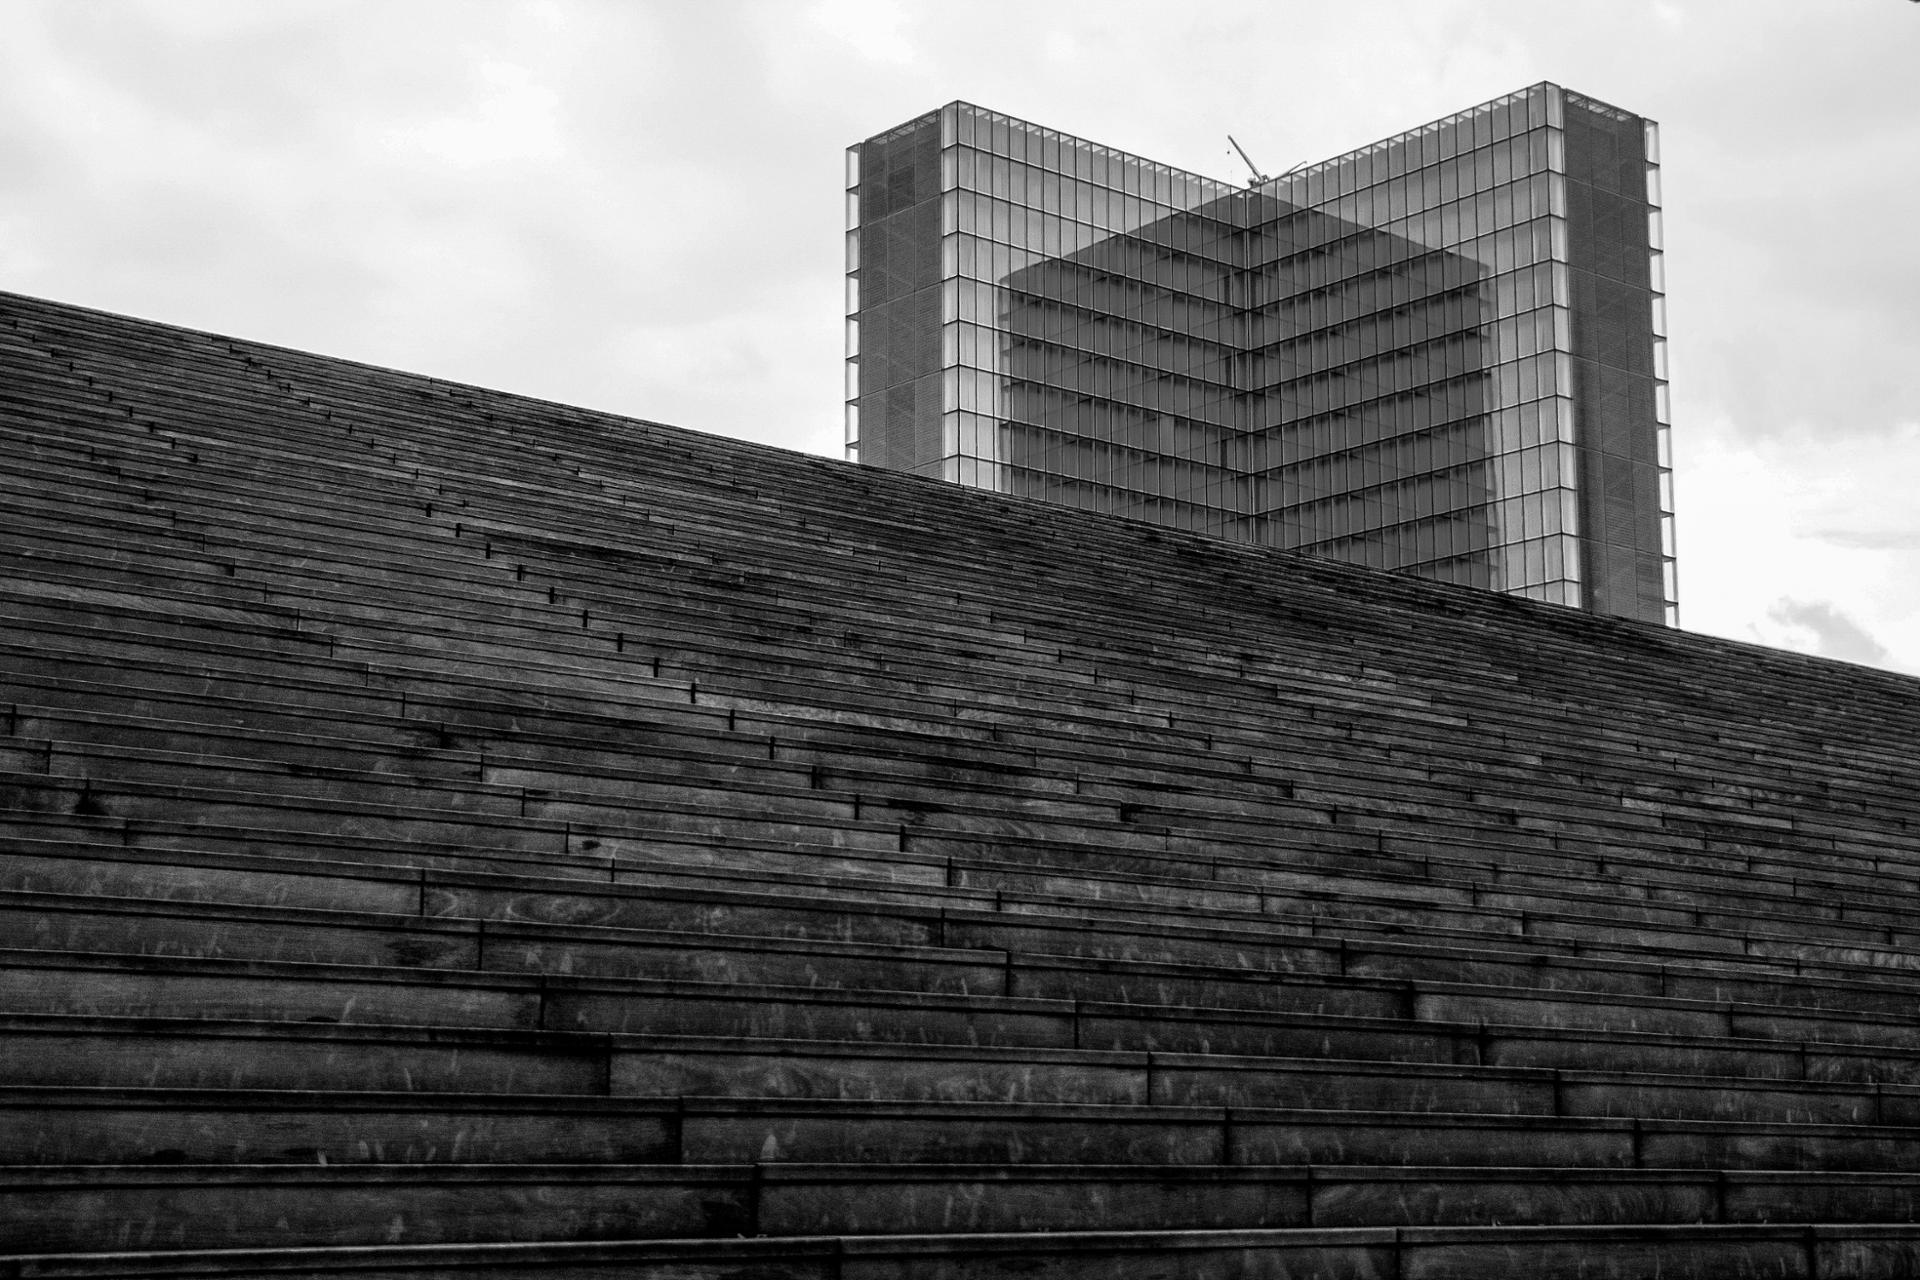 Escaliers vers la culture